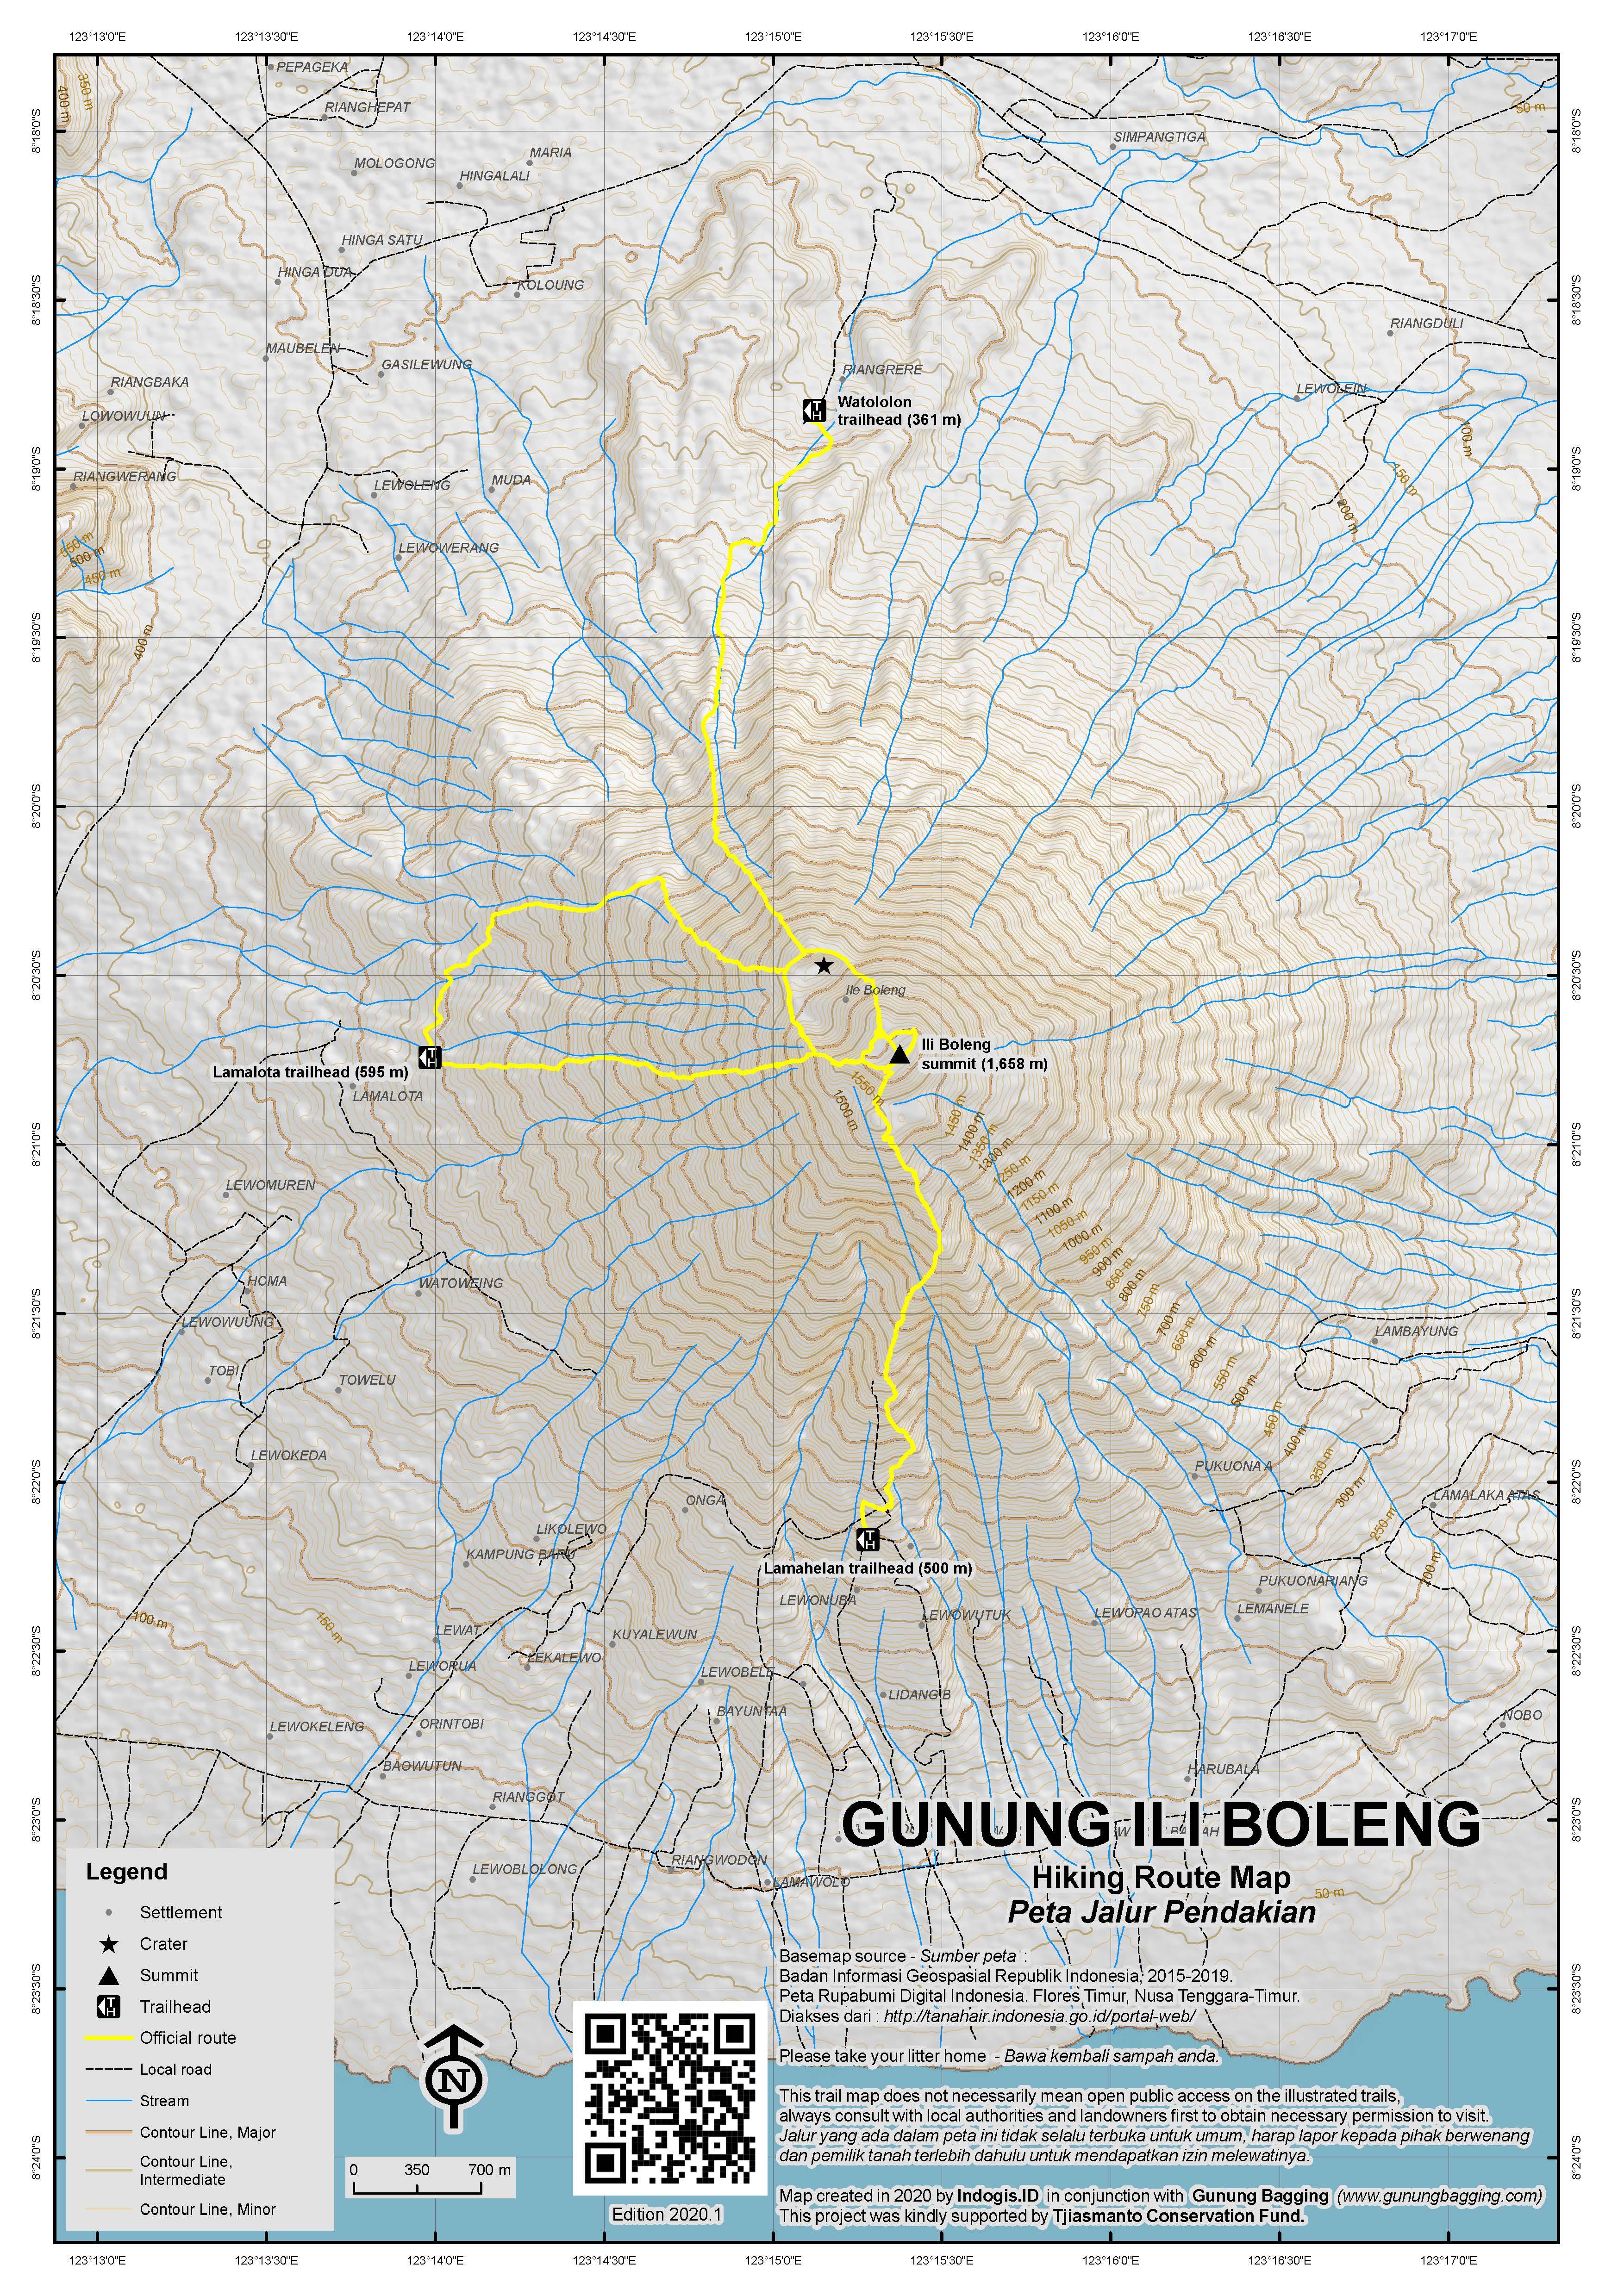 Peta Jalur Pendakian Ili Boleng